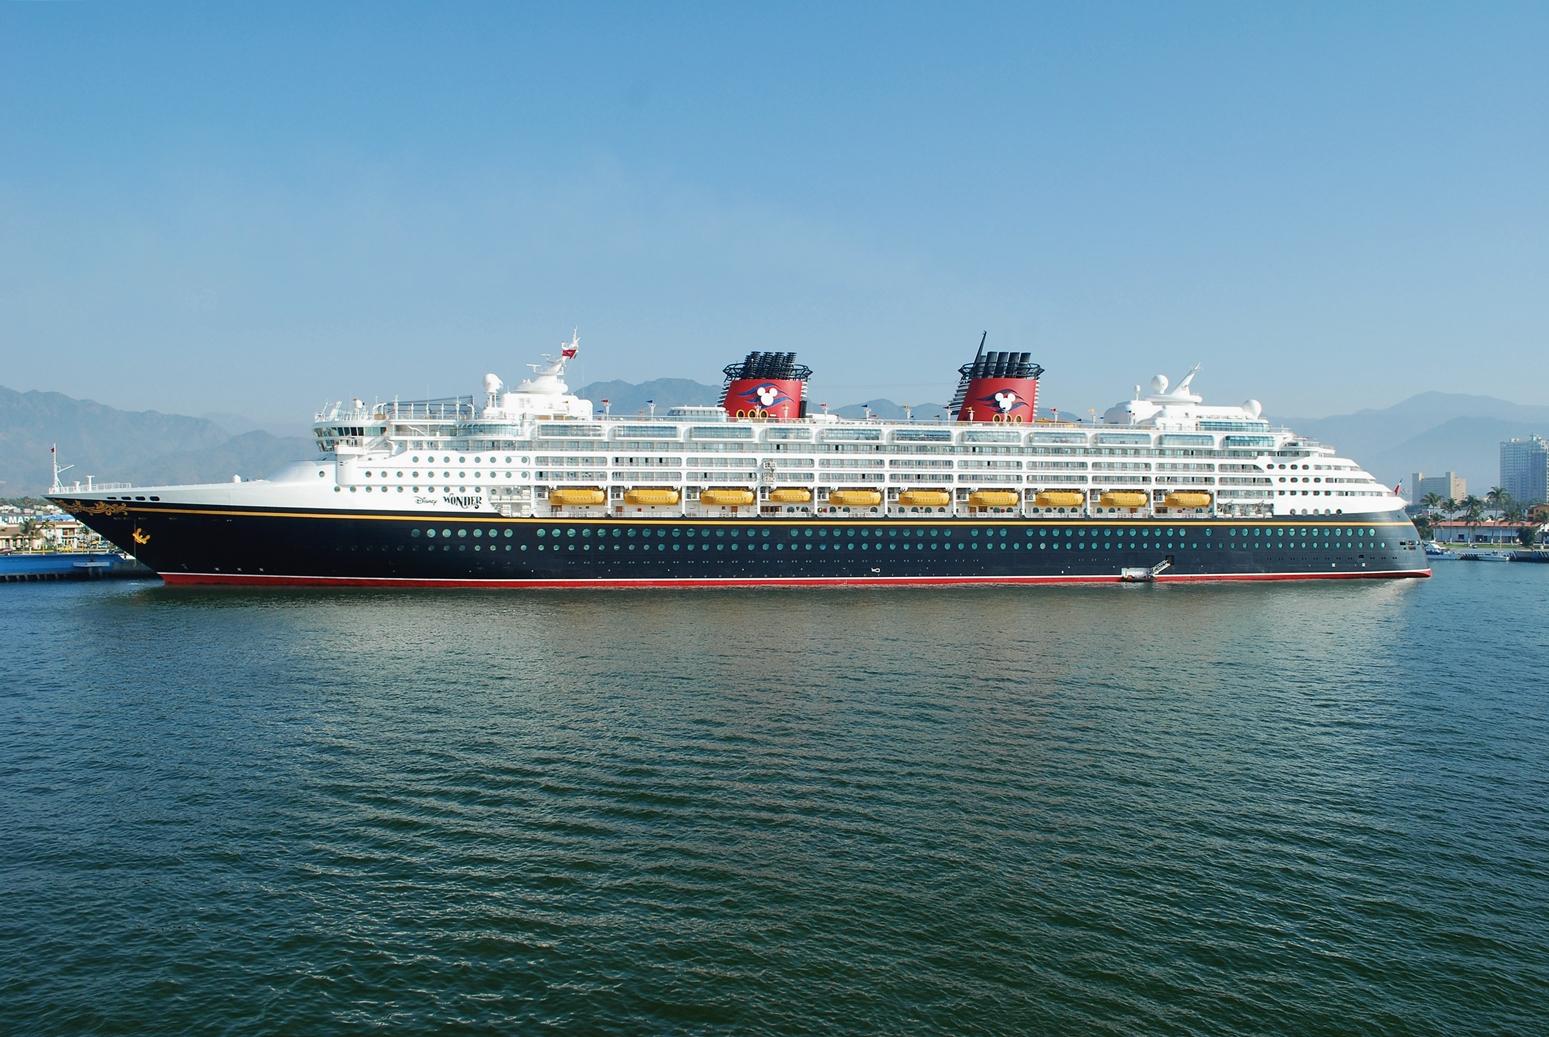 Disney Stock Chart 10 Years: Disney Cruise Line - Wikipedia,Chart